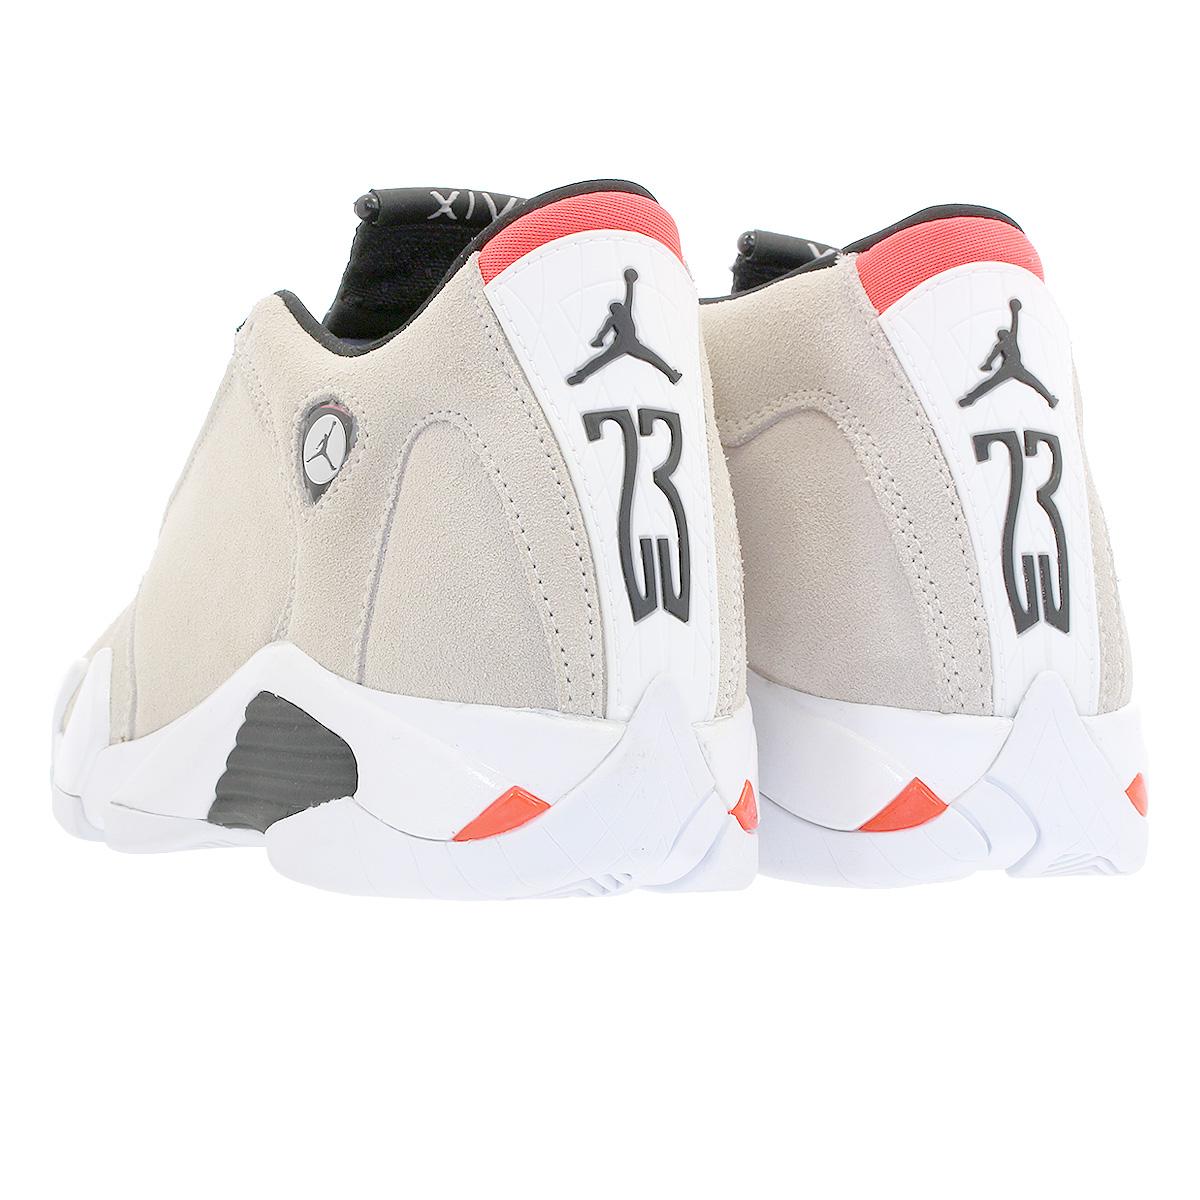 hot sale online a8807 3525b NIKE AIR JORDAN 14 RETRO BG Nike Air Jordan 14 nostalgic BG DESERT  SAND/BLACK/WHITE/INFRARED 23 487,524-021